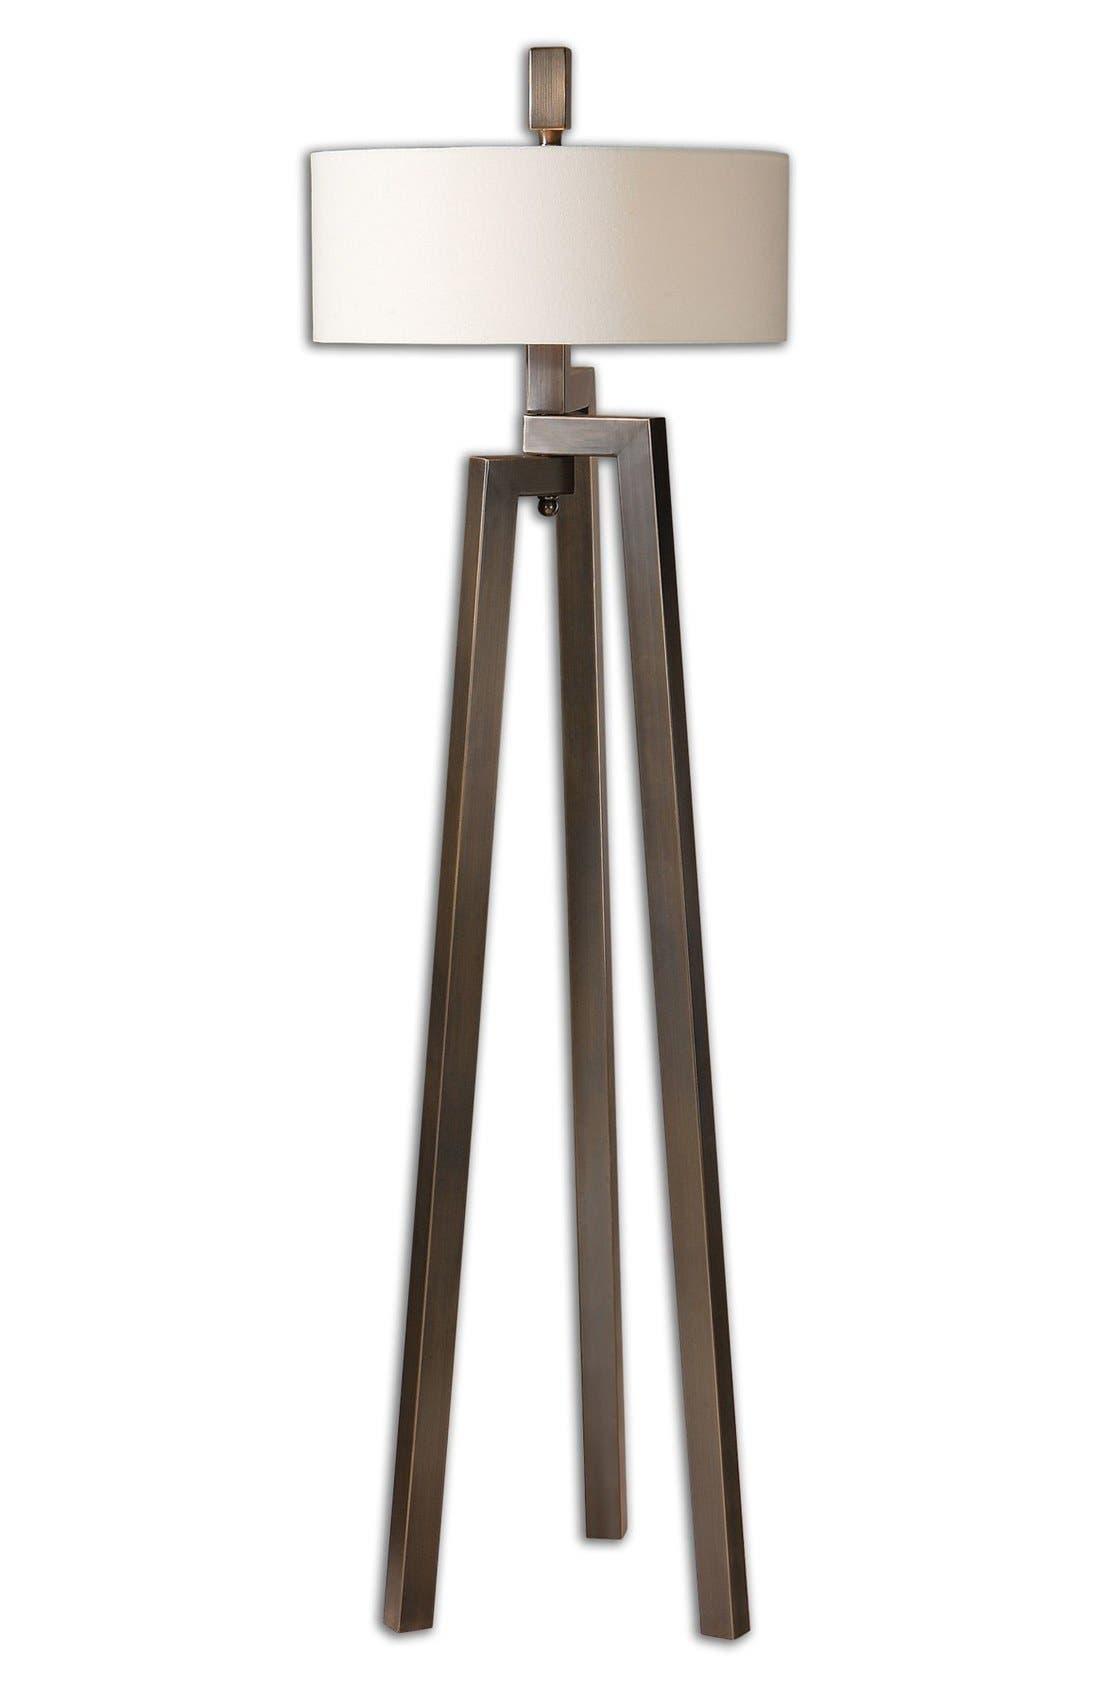 Main Image - Uttermost 'Mondovi' Hand Forged Metal Floor Lamp